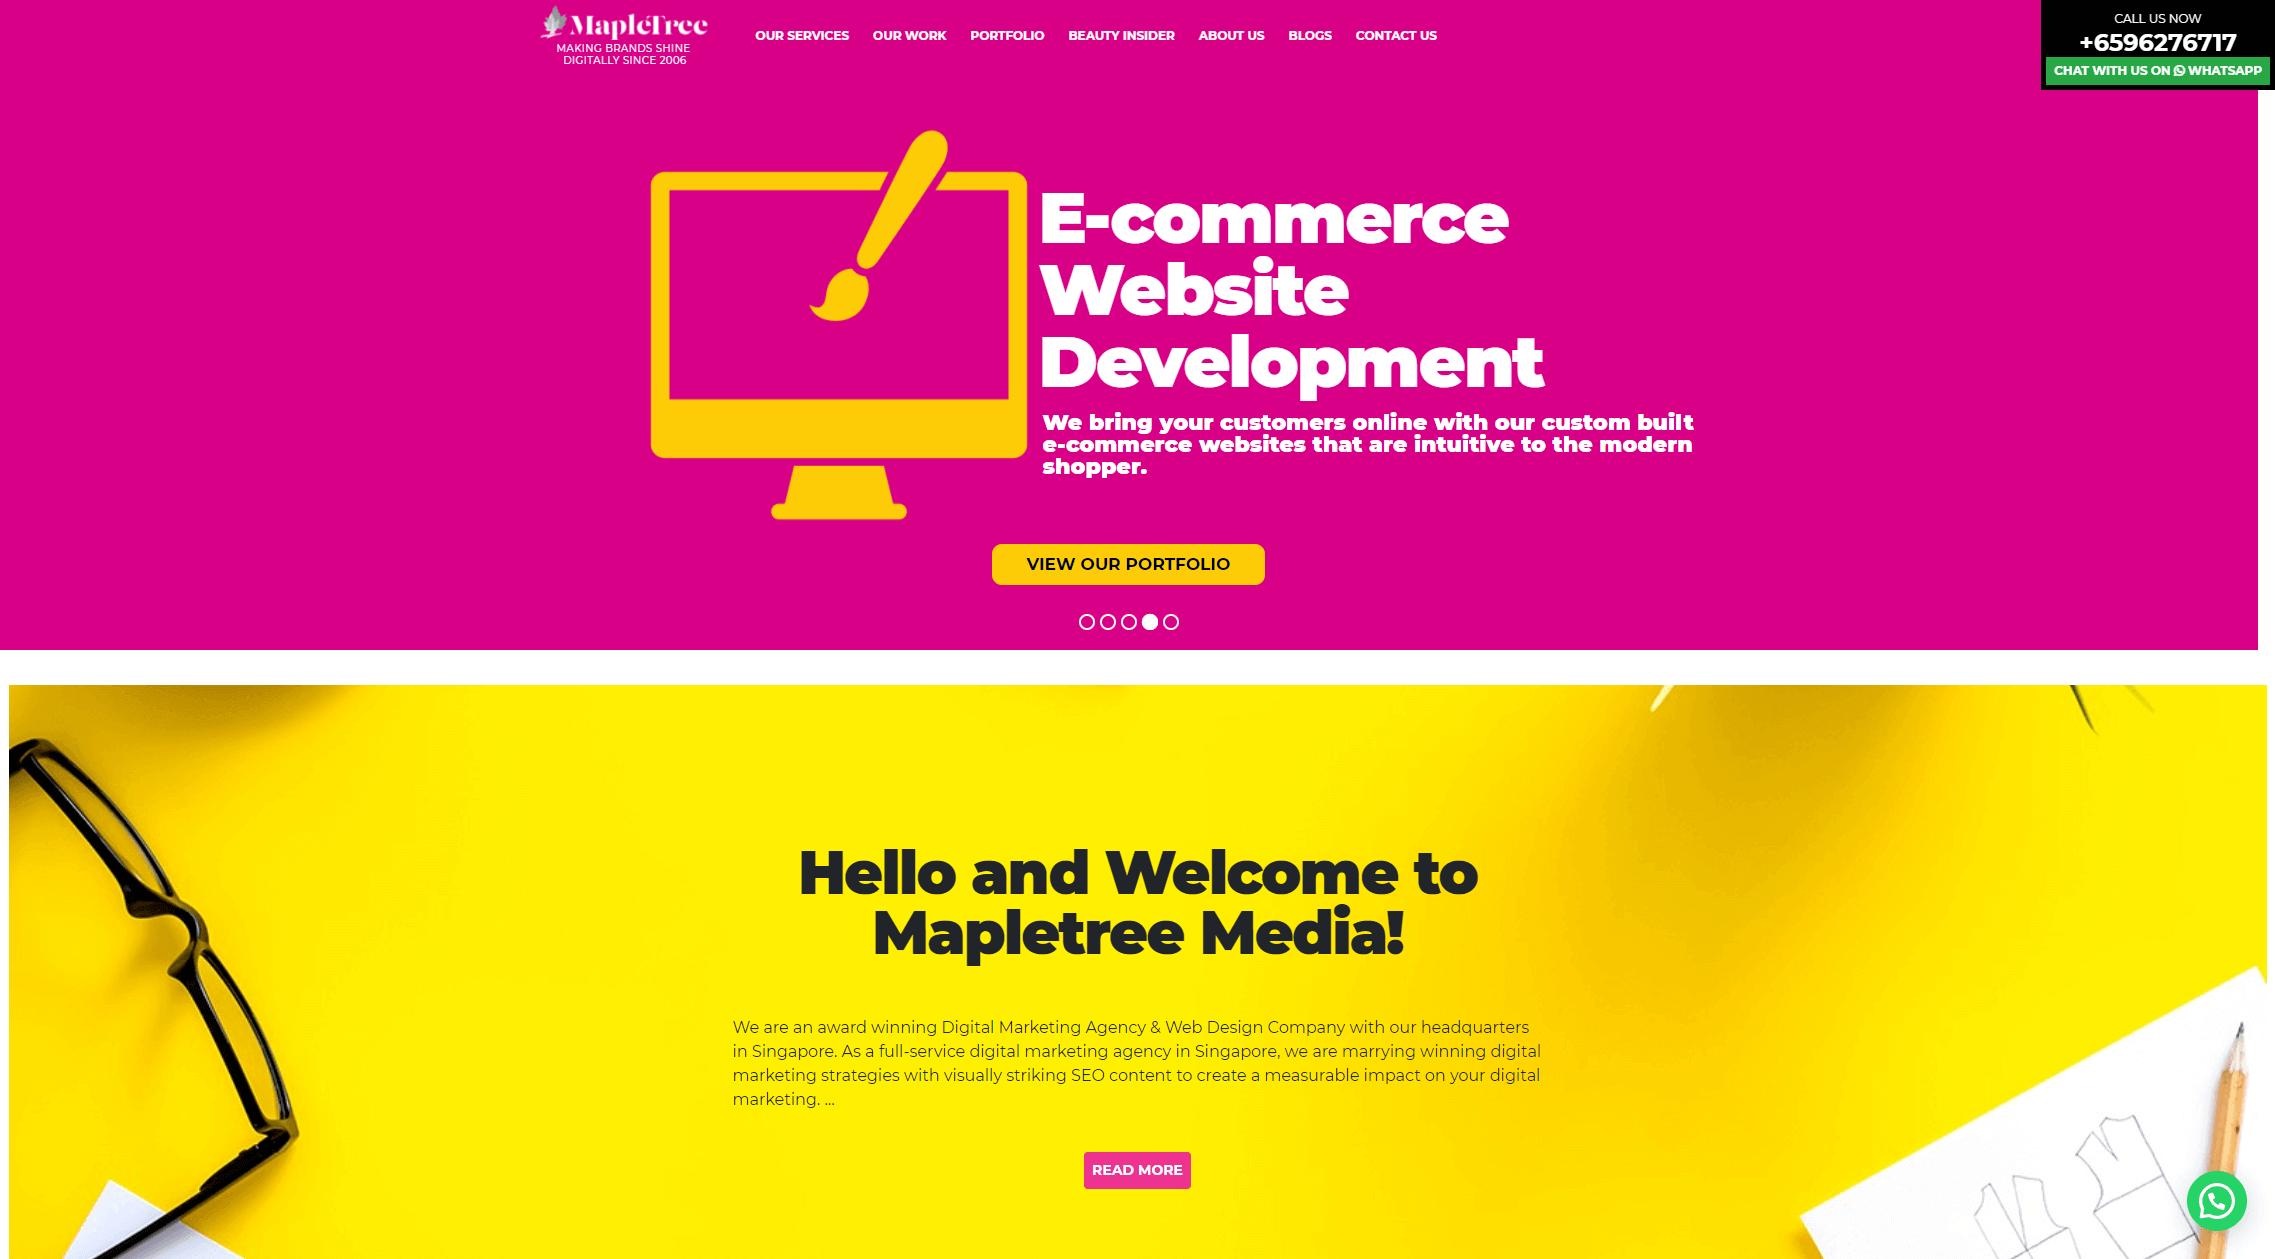 mapletreemedia.com